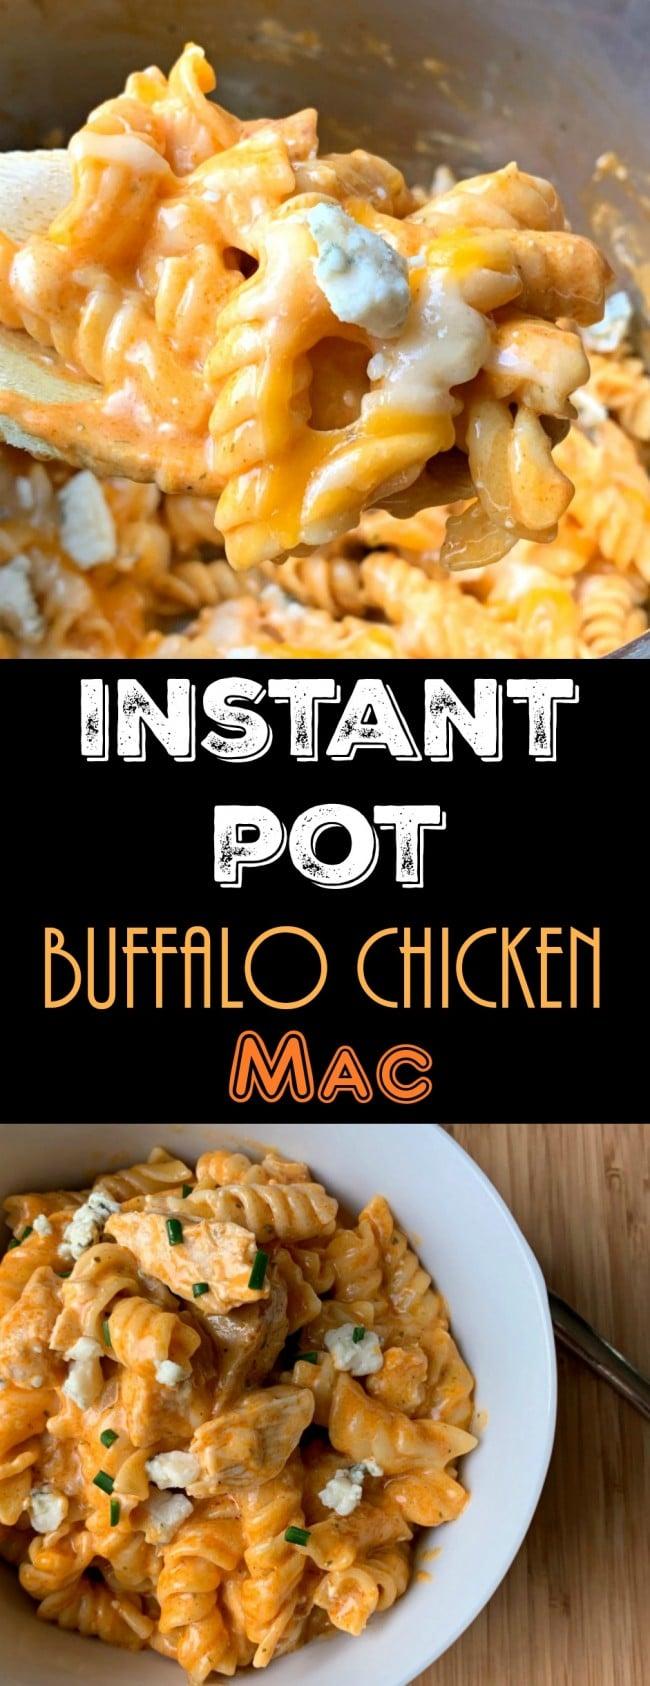 Instant Pot Buffalo Chicken Pinterest photo